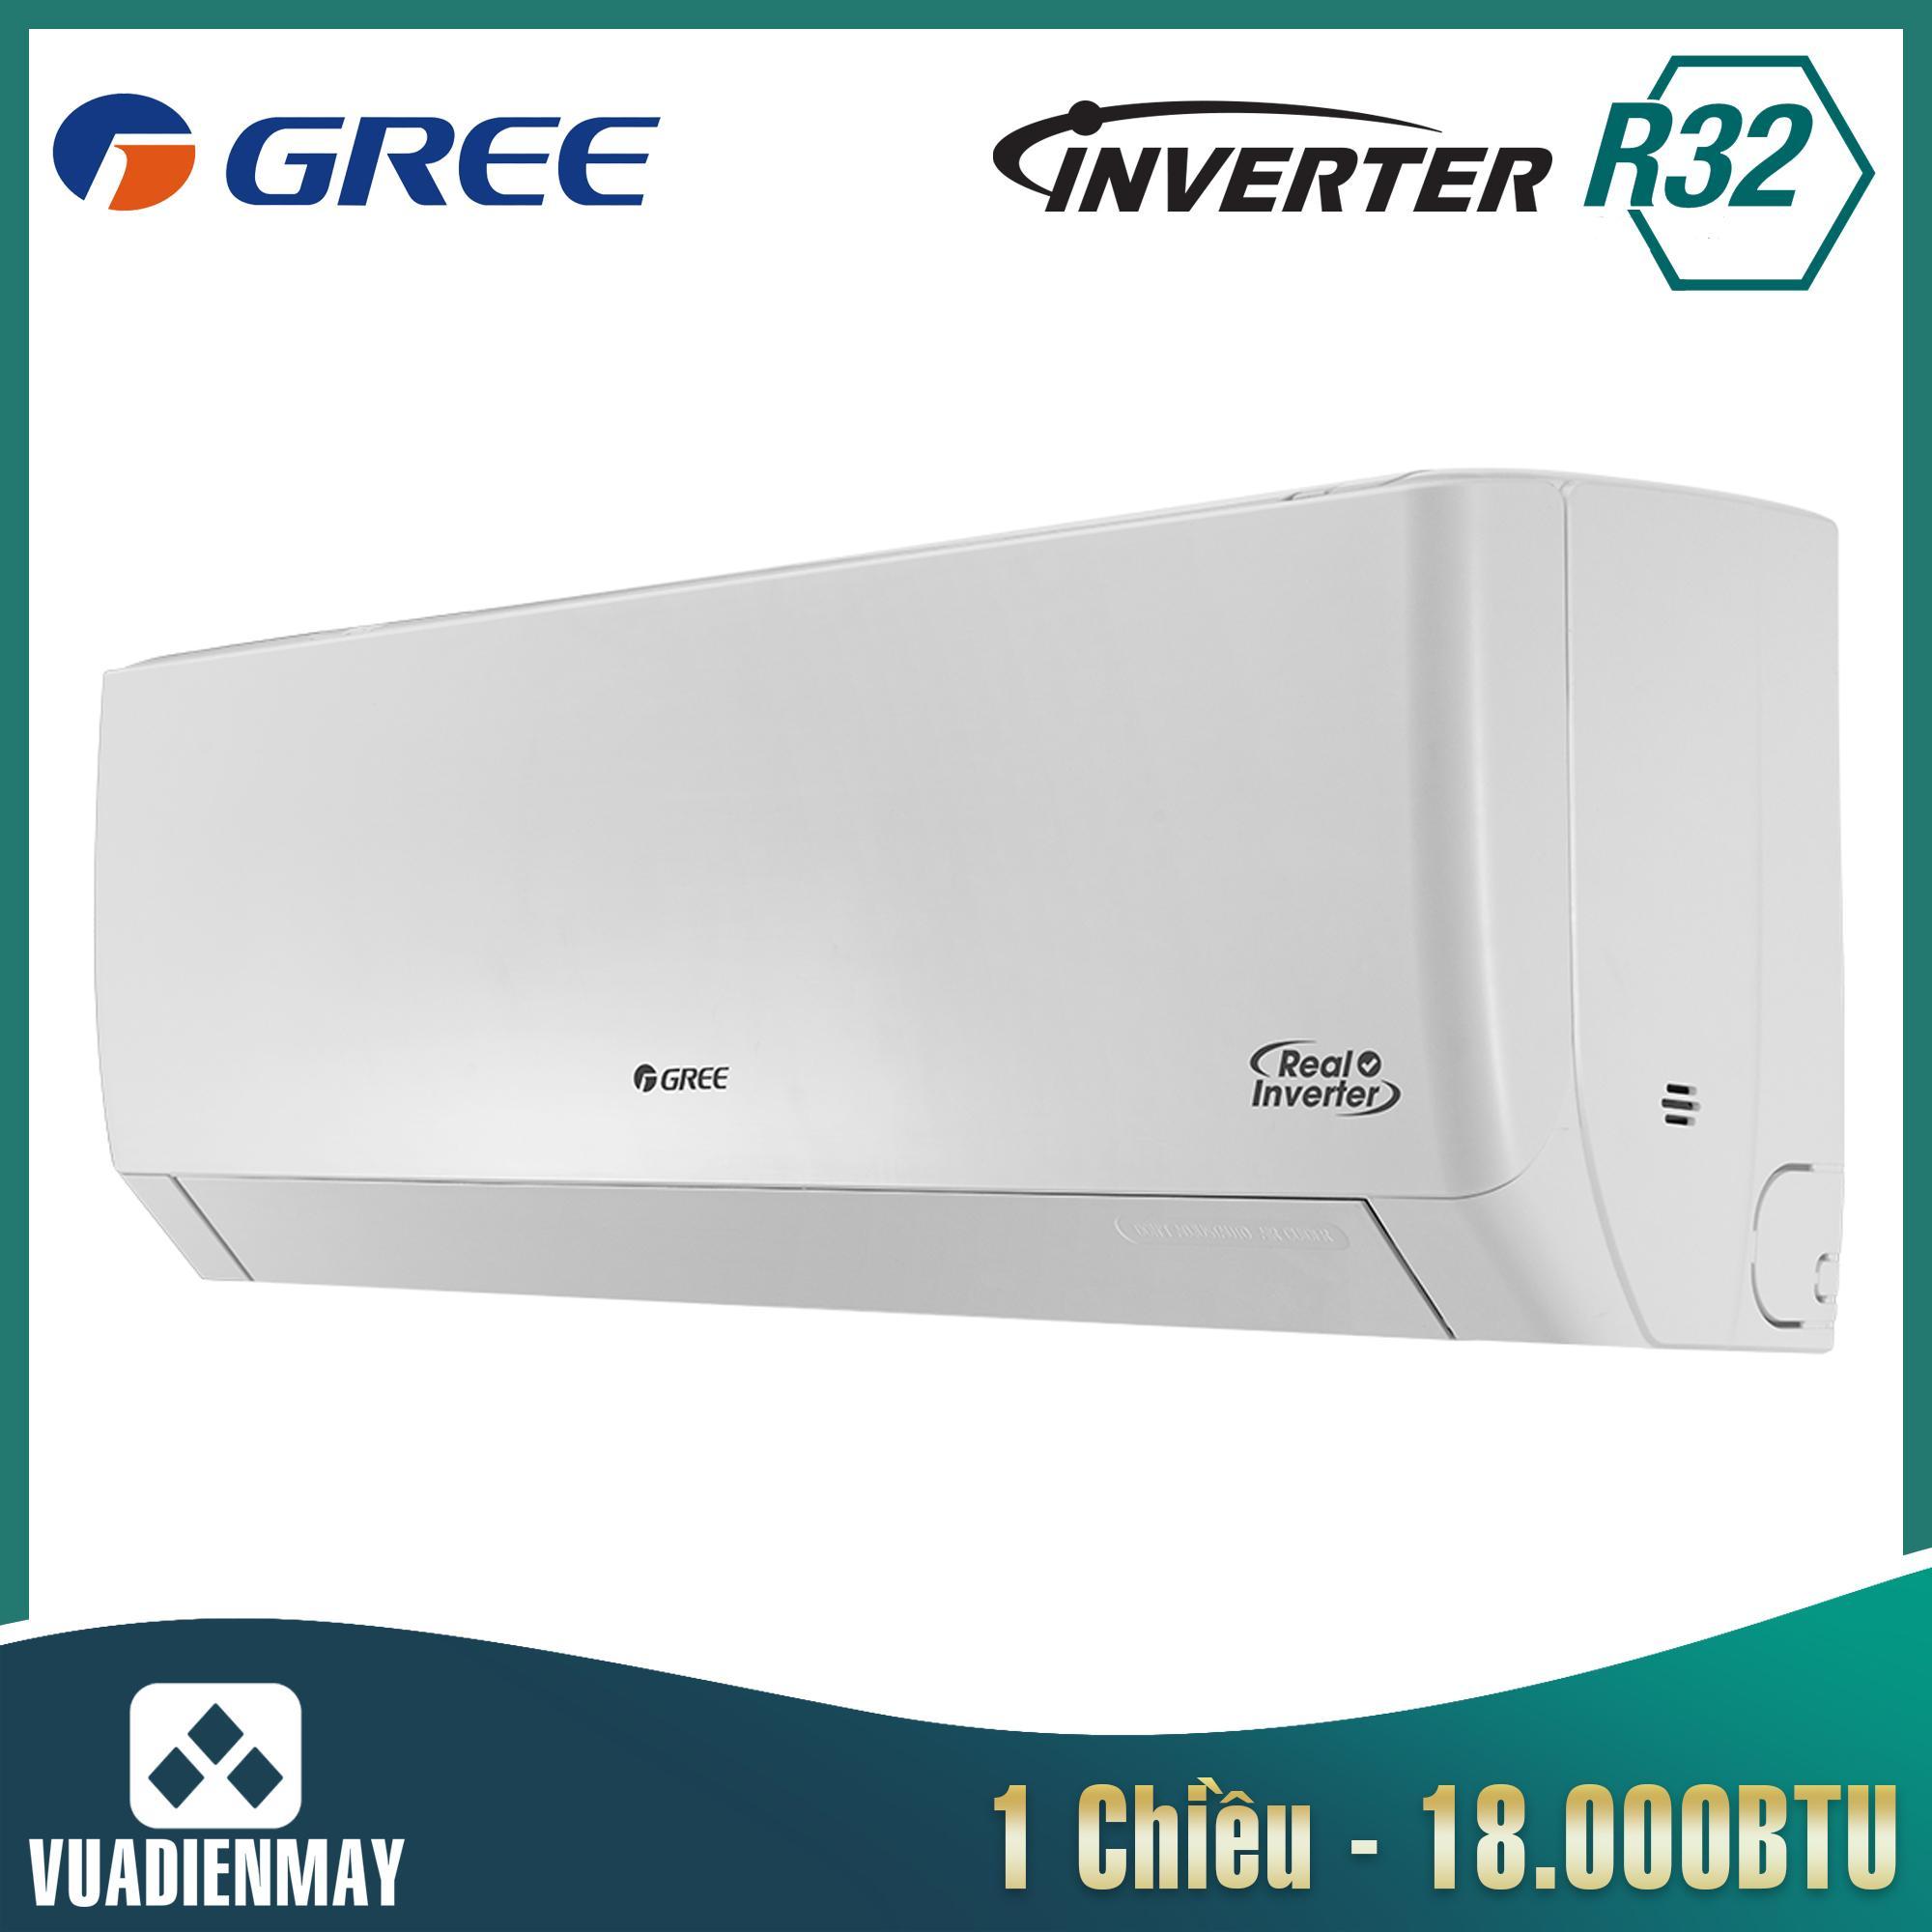 GWH18PD, Điều hòa Gree 18000BTU 2 chiều Inverter